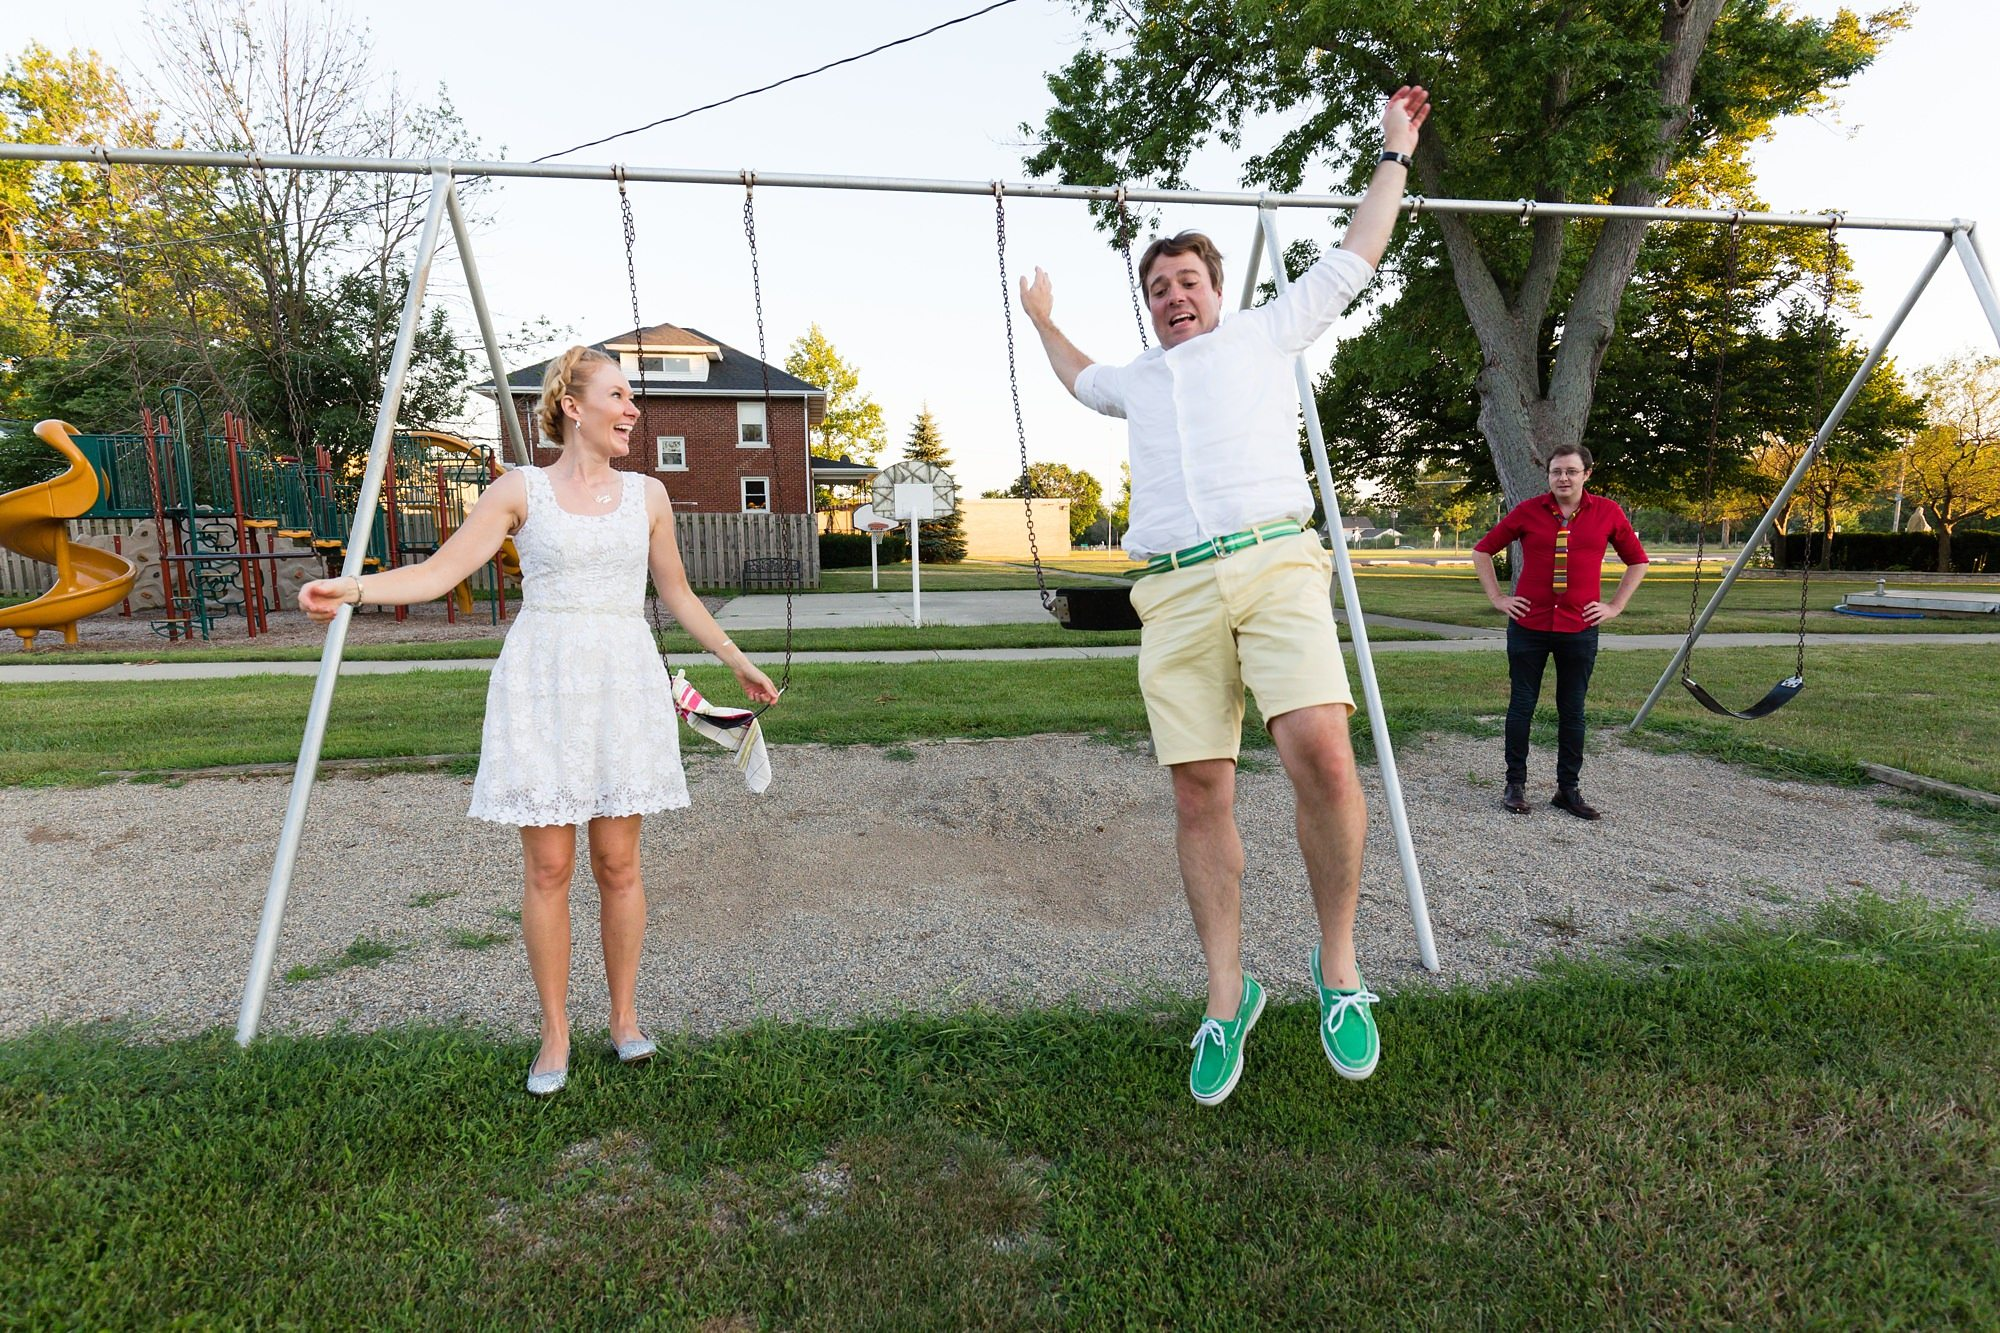 Groom jumps off swing at destination wedding in Ft. Wayne Indiana